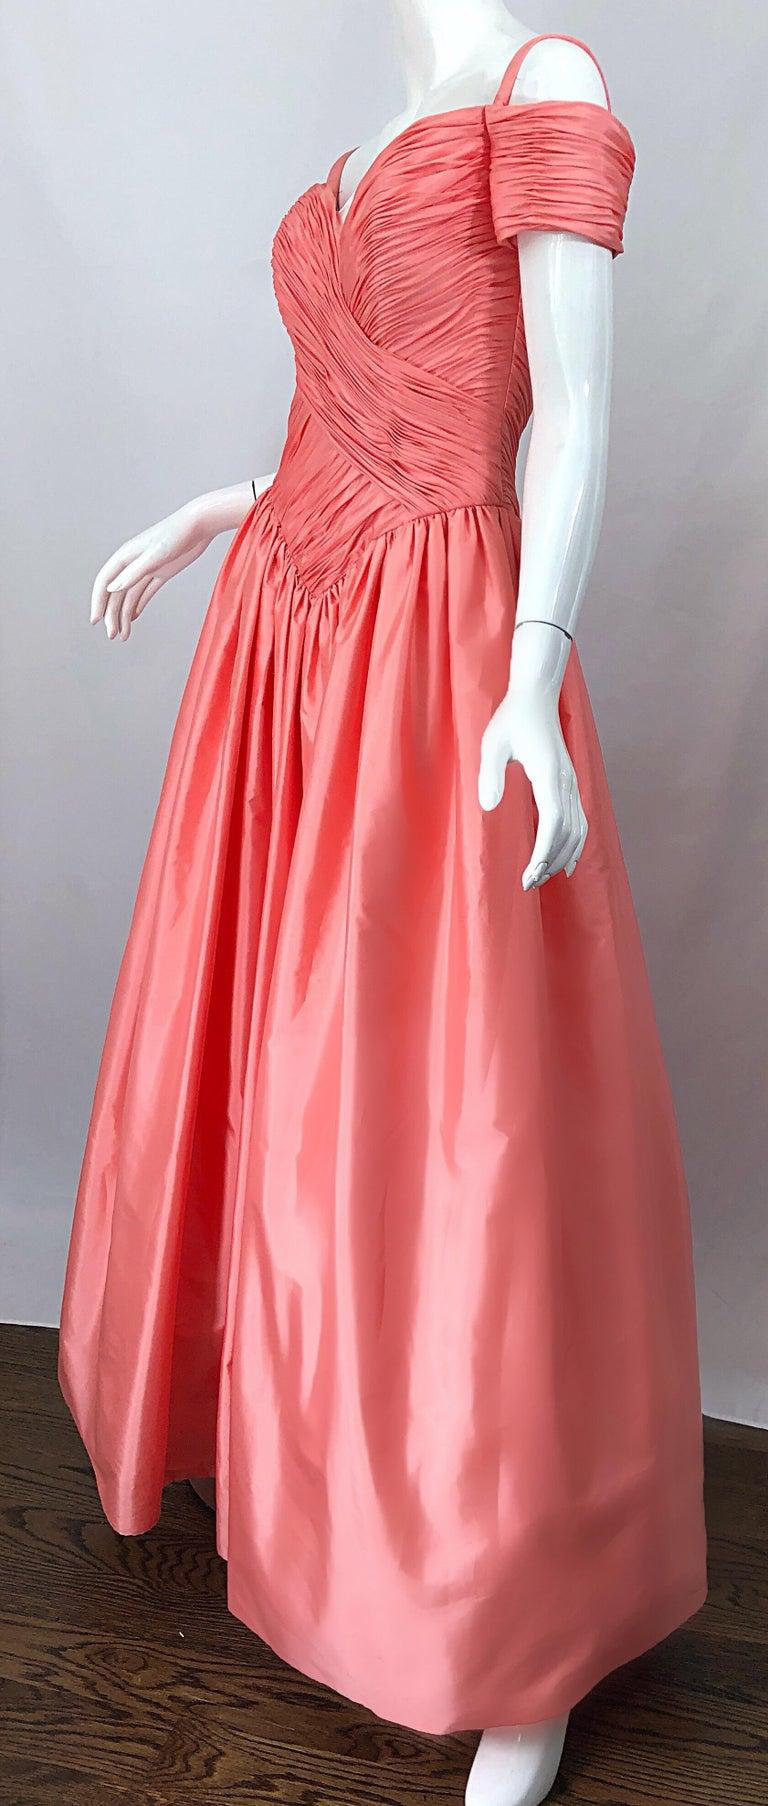 1980s Chris Kole Coral Pink Size 6 Off the Shoulder Silk Taffeta Vintage Gown For Sale 7